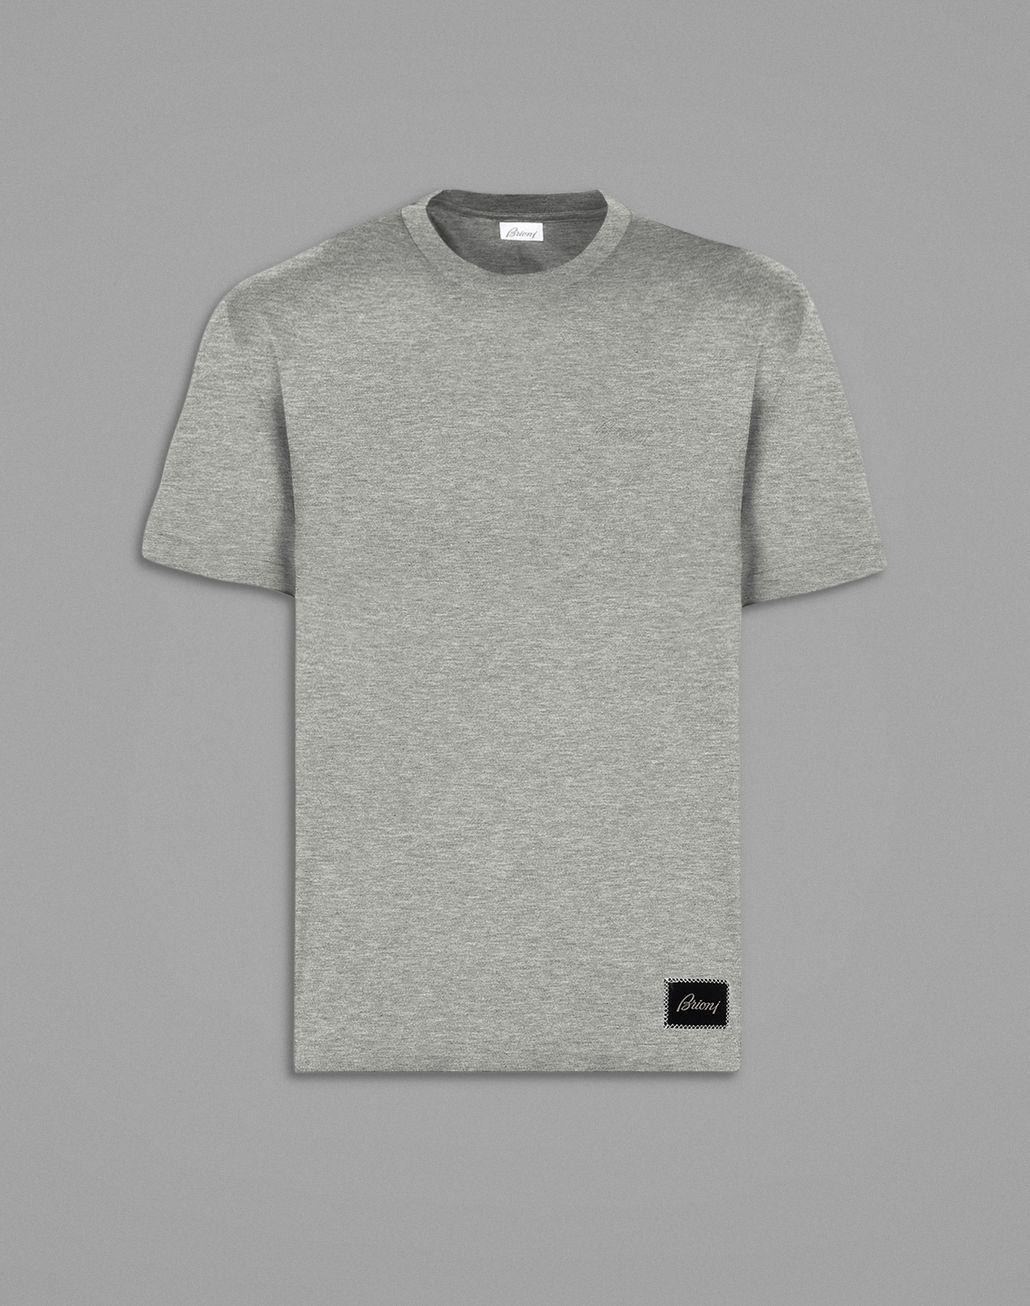 BRIONI Gray T-Shirt T-Shirts & Polos Man f